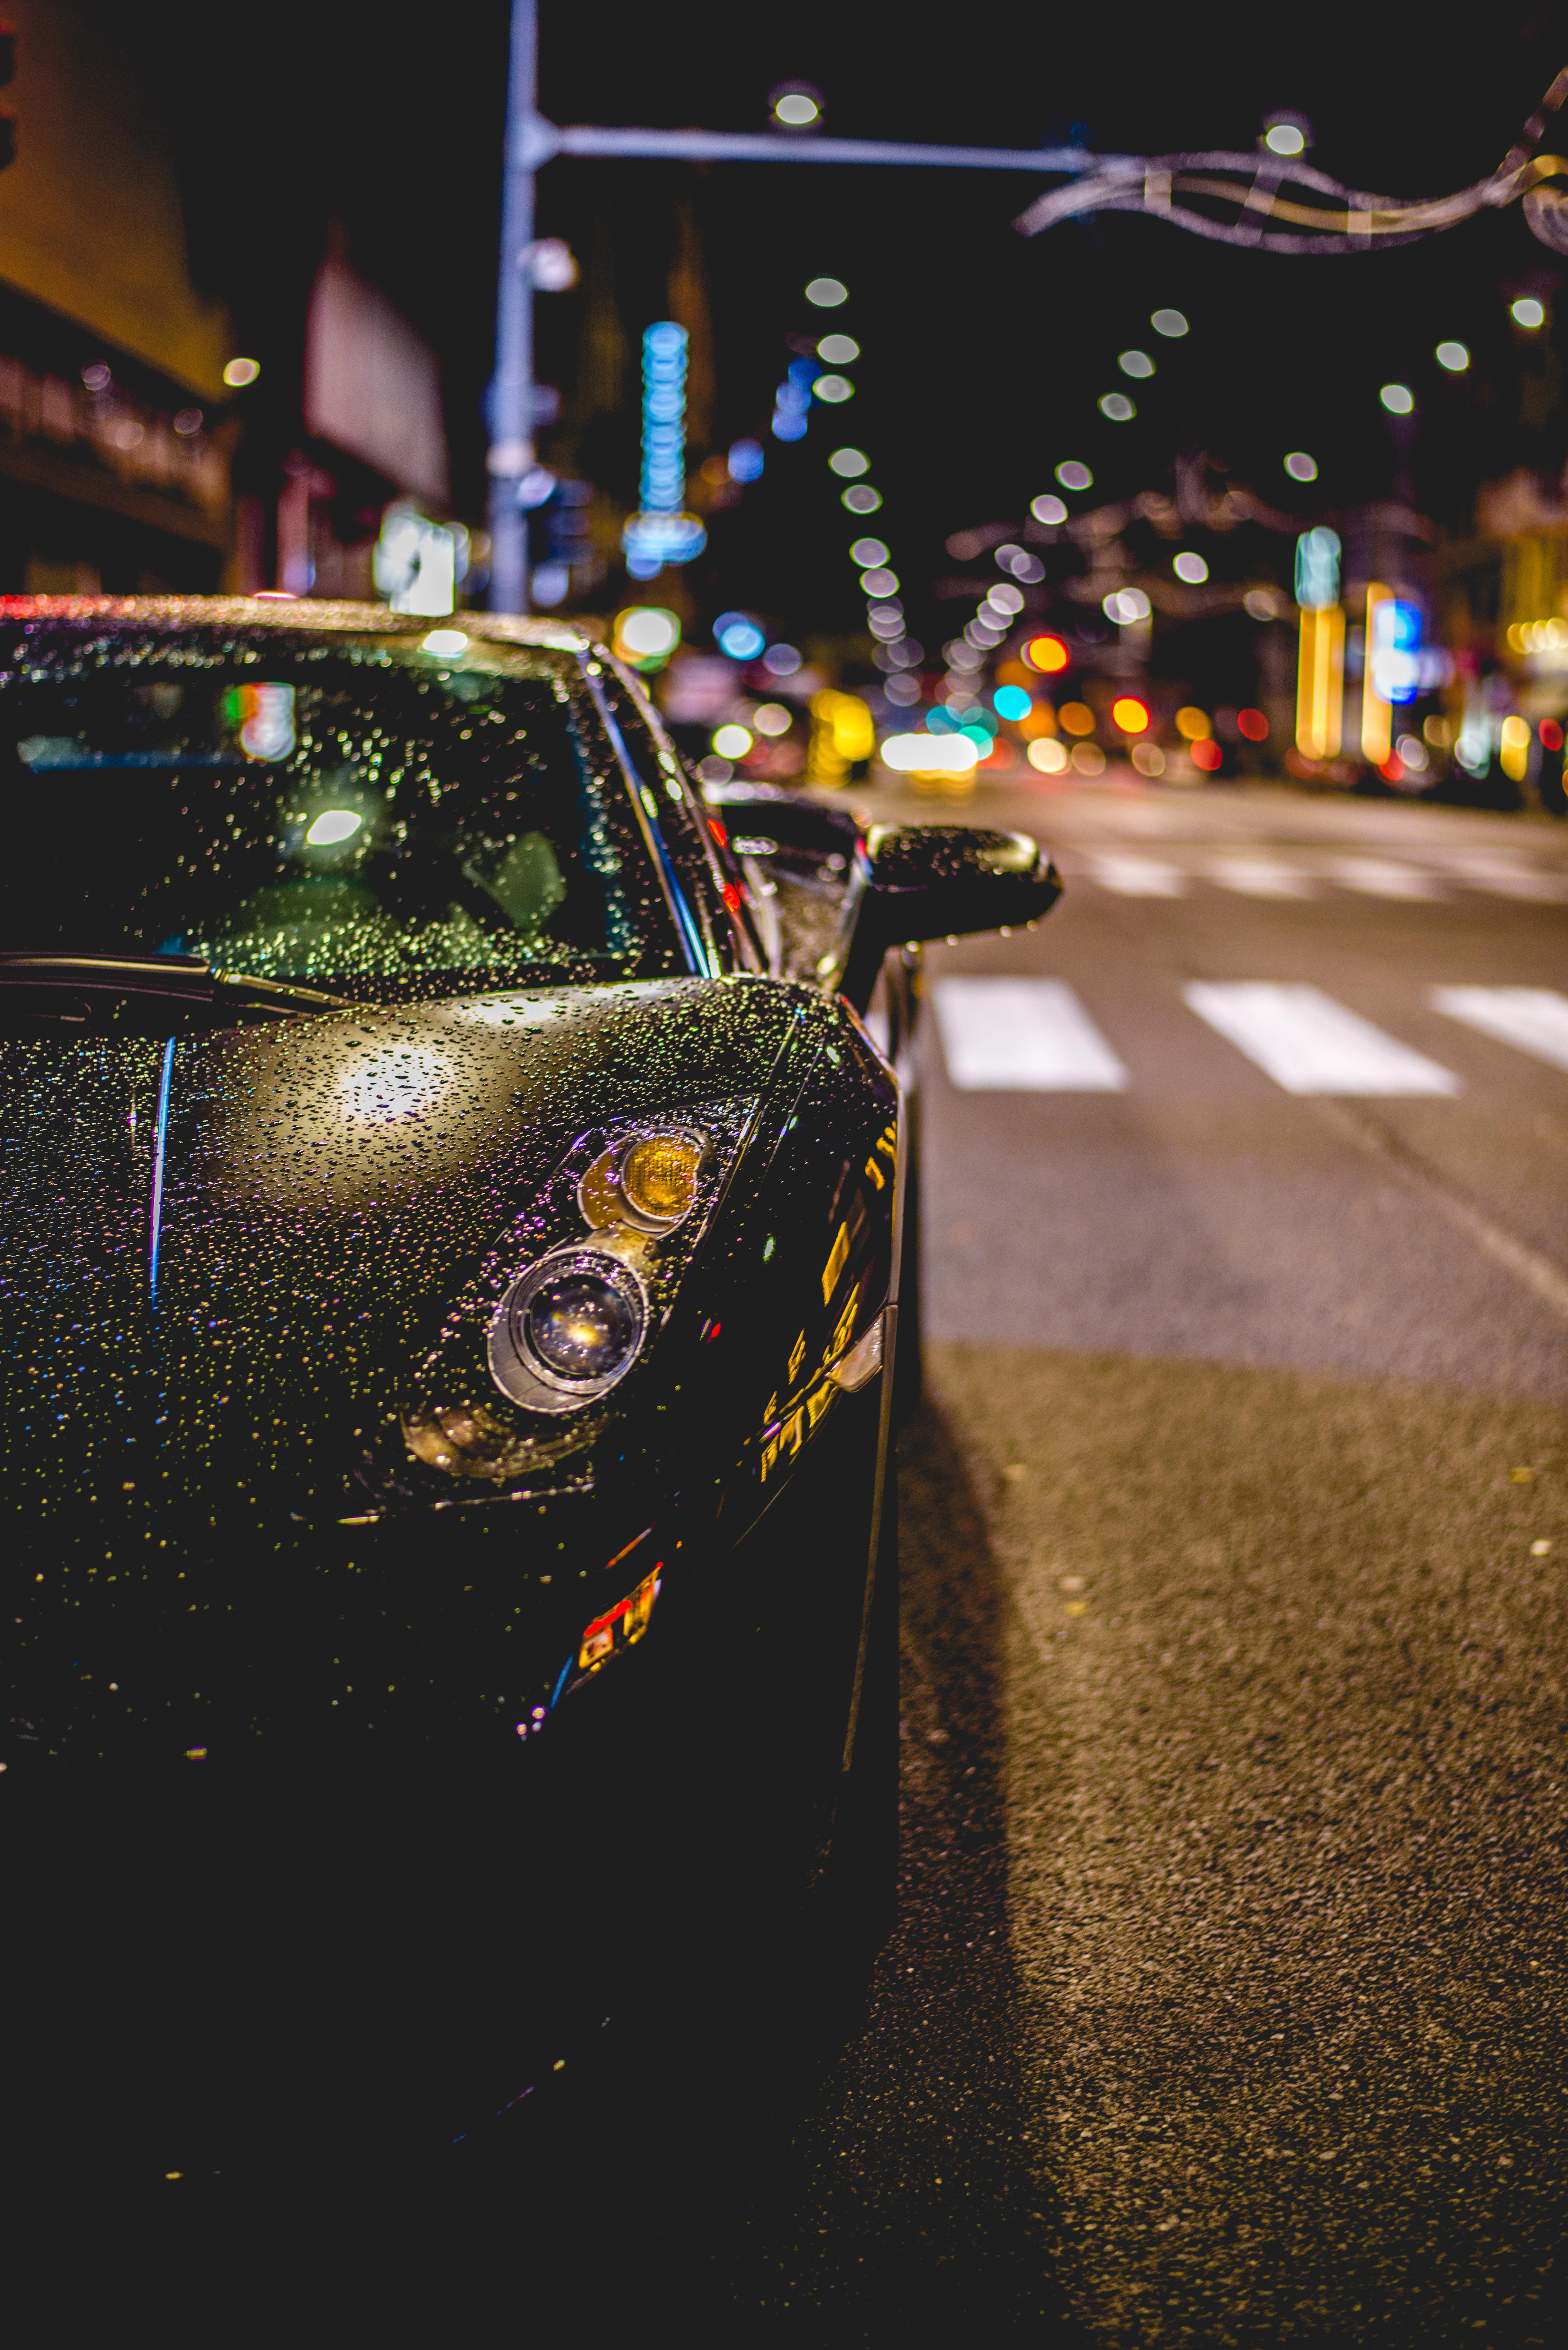 General 4912x7360 car street night road Lamborghini Aventador J black cars lights bokeh